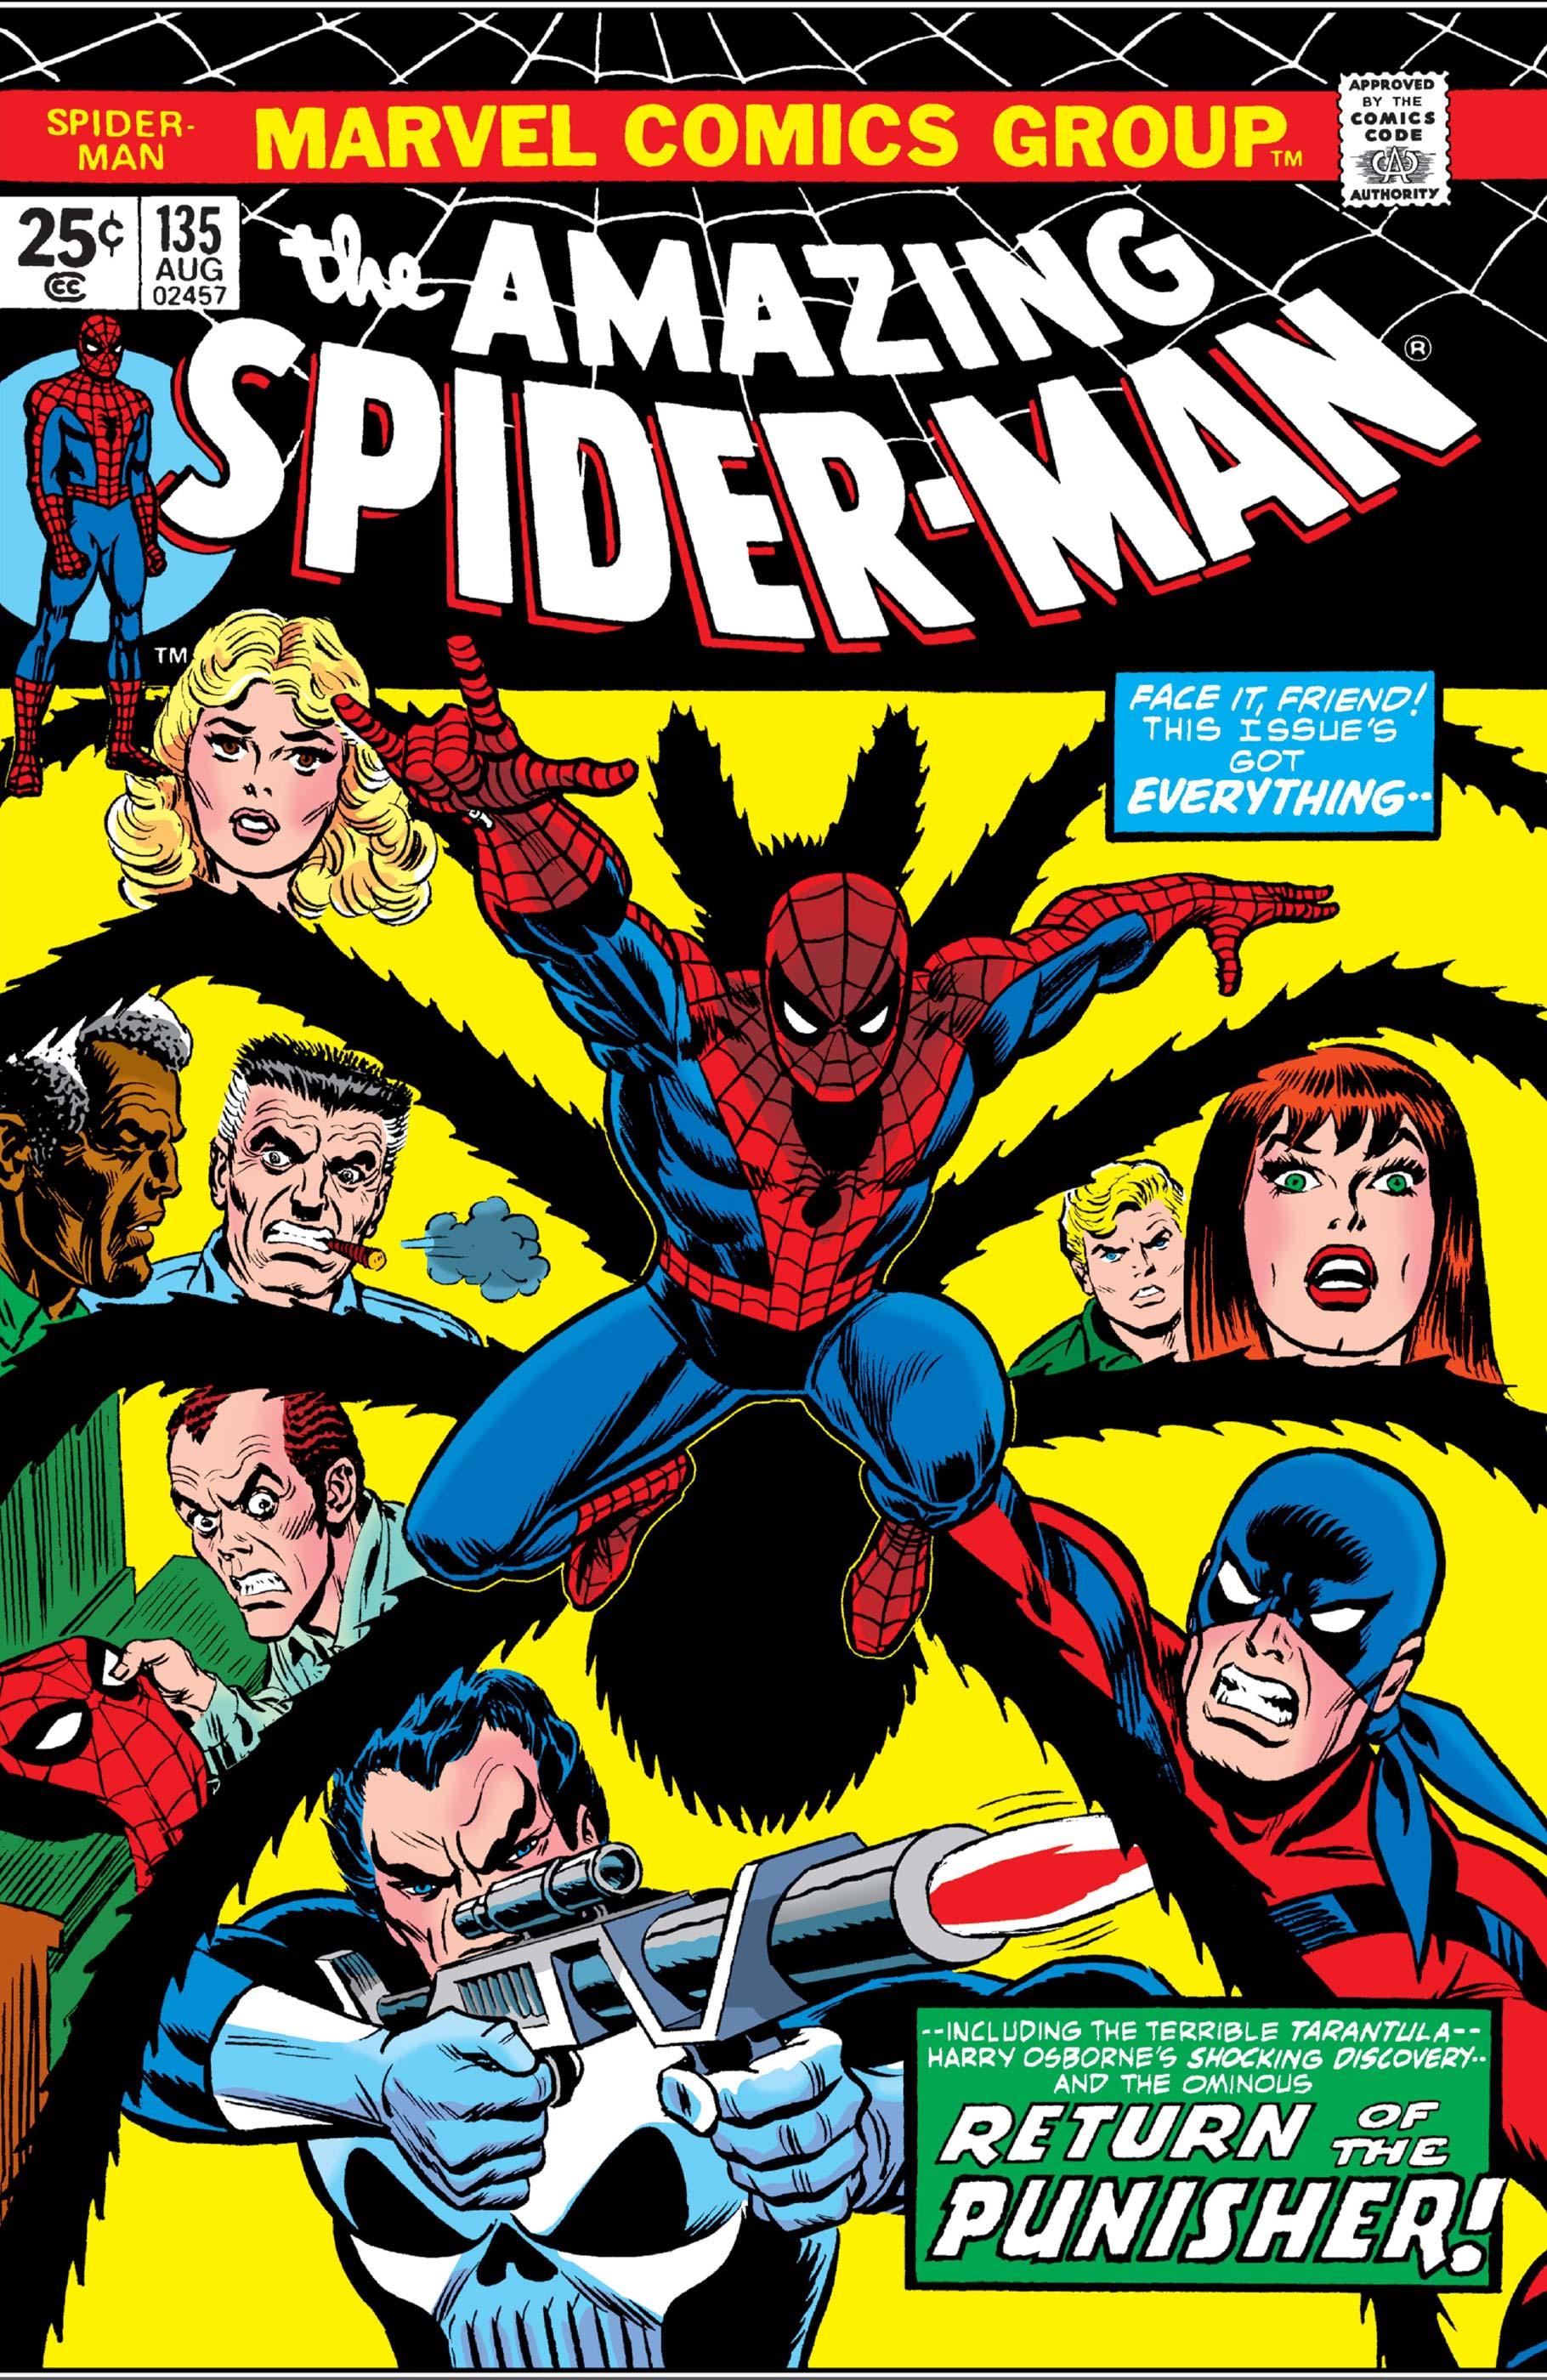 The Amazing Spider-Man (1963) #135